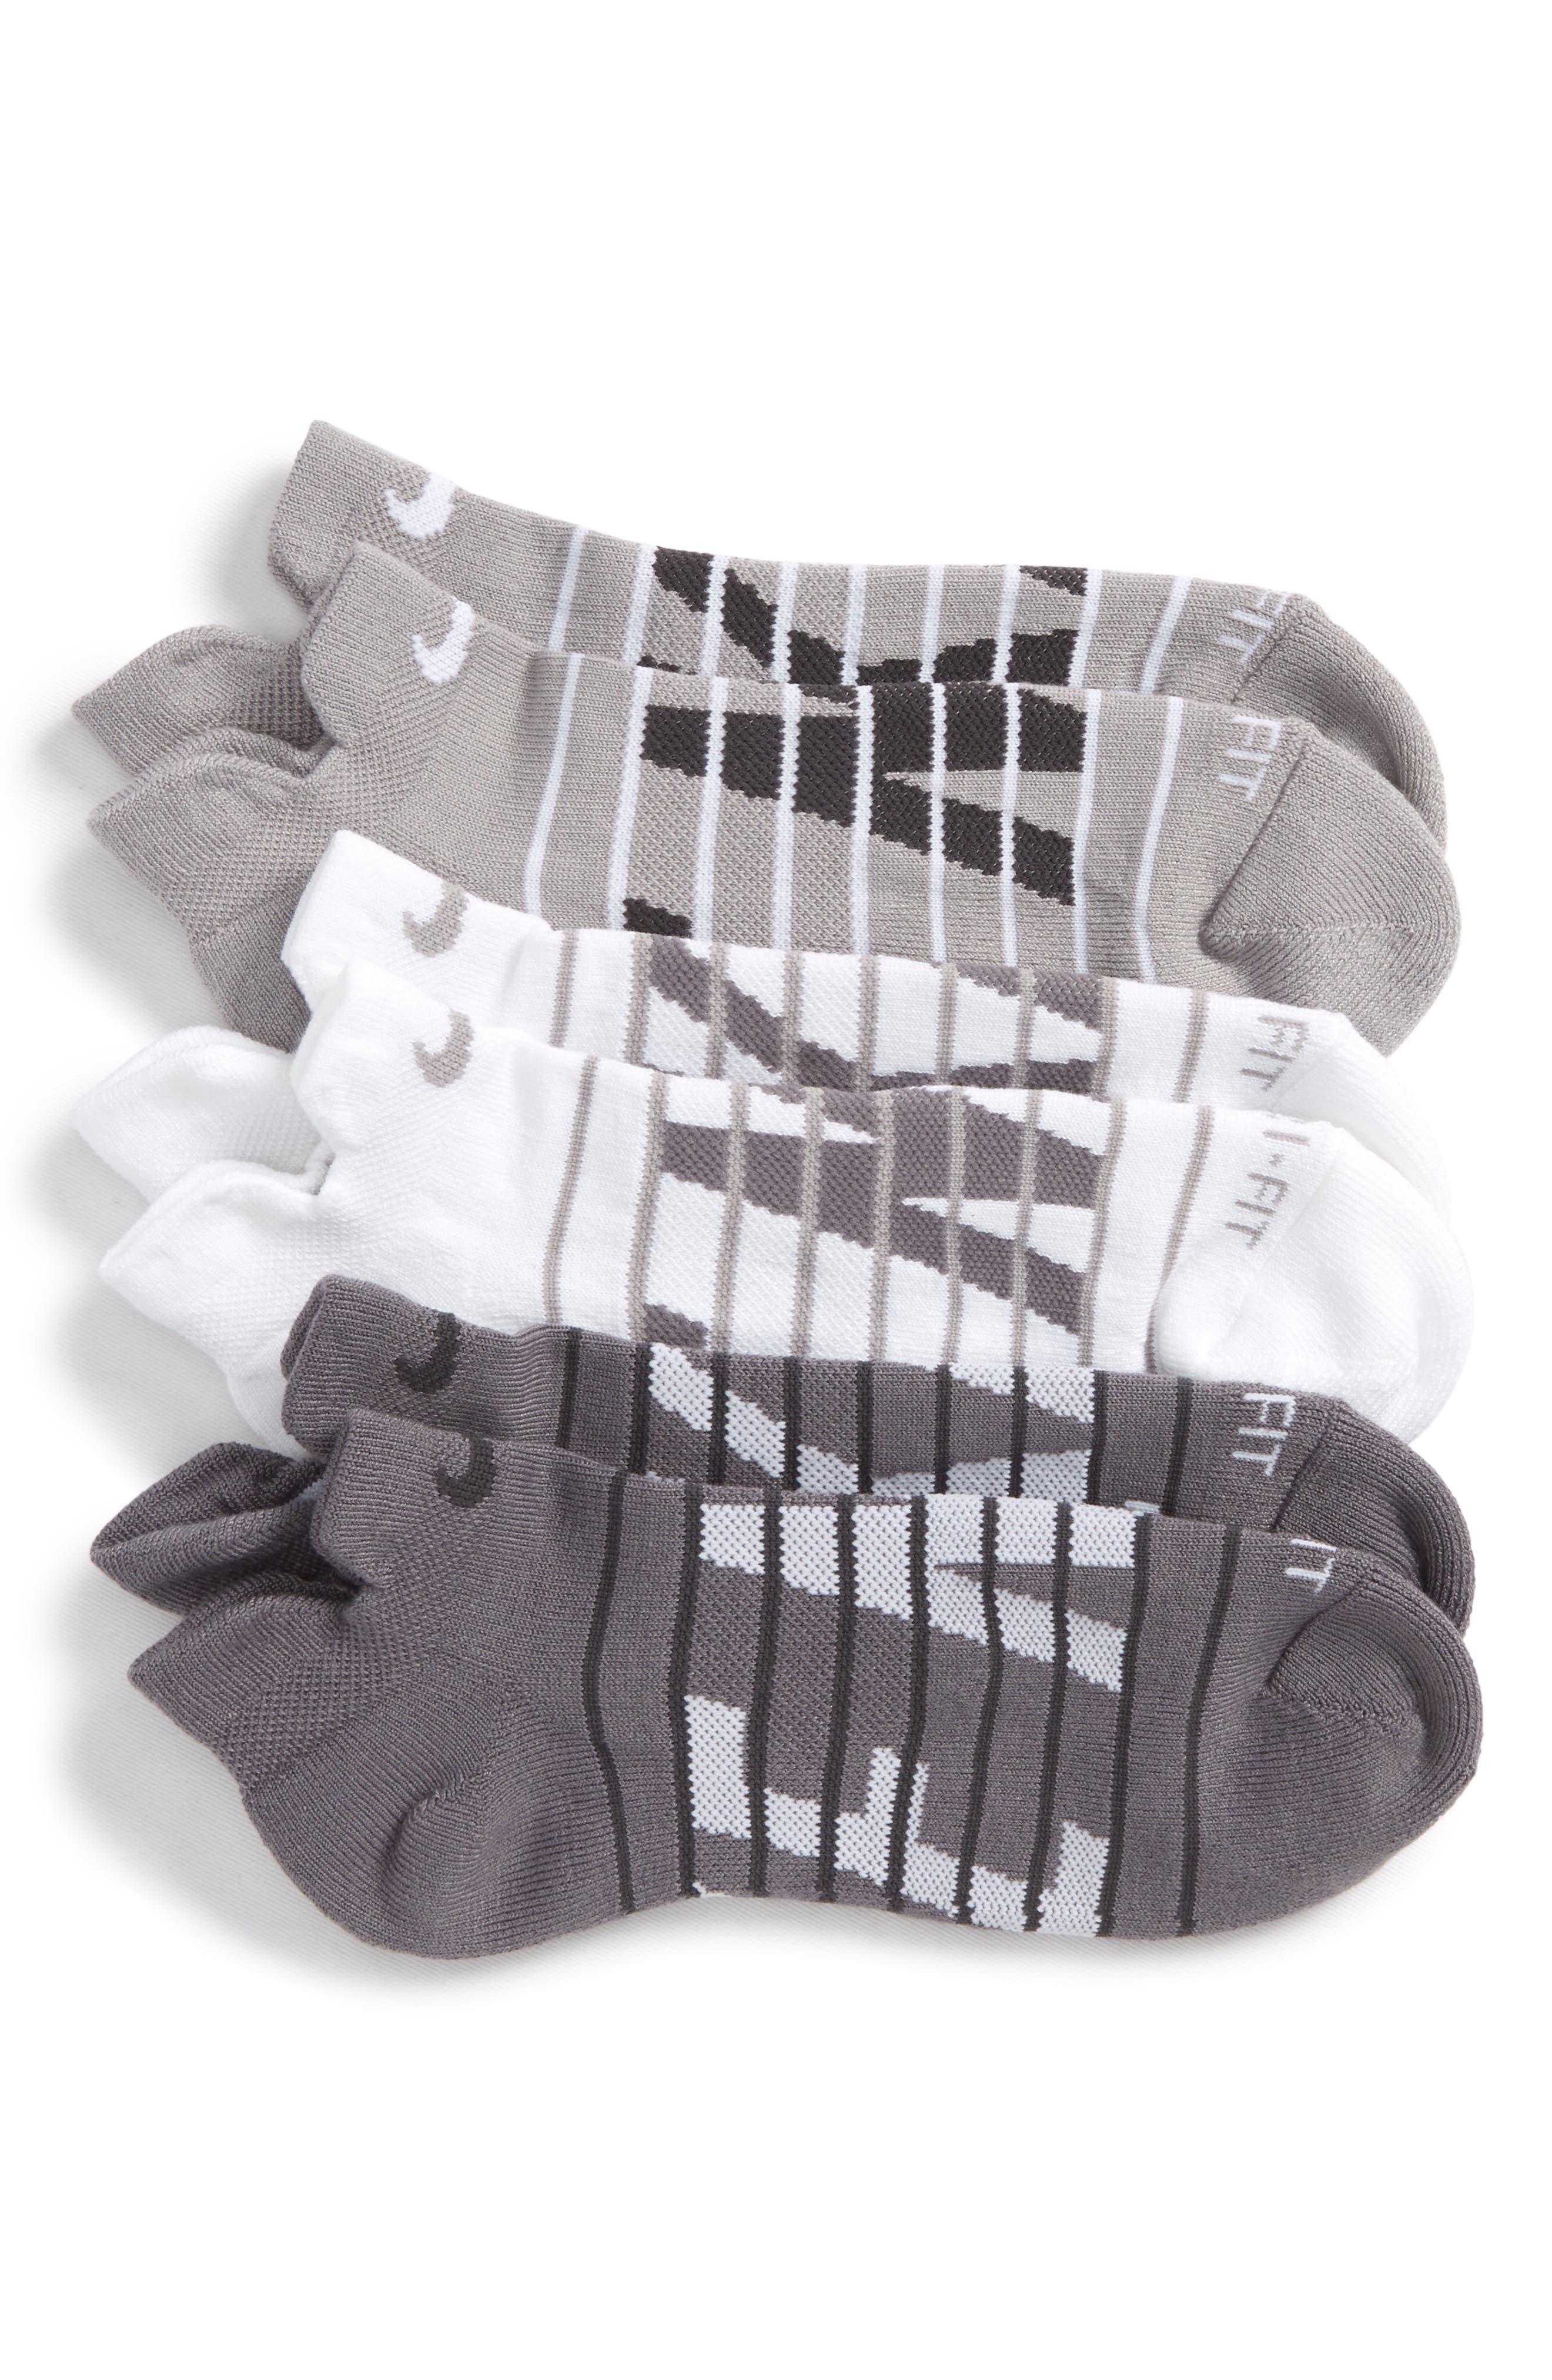 Dry Cushion 3-Pack Low-Cut Socks,                         Main,                         color, 020